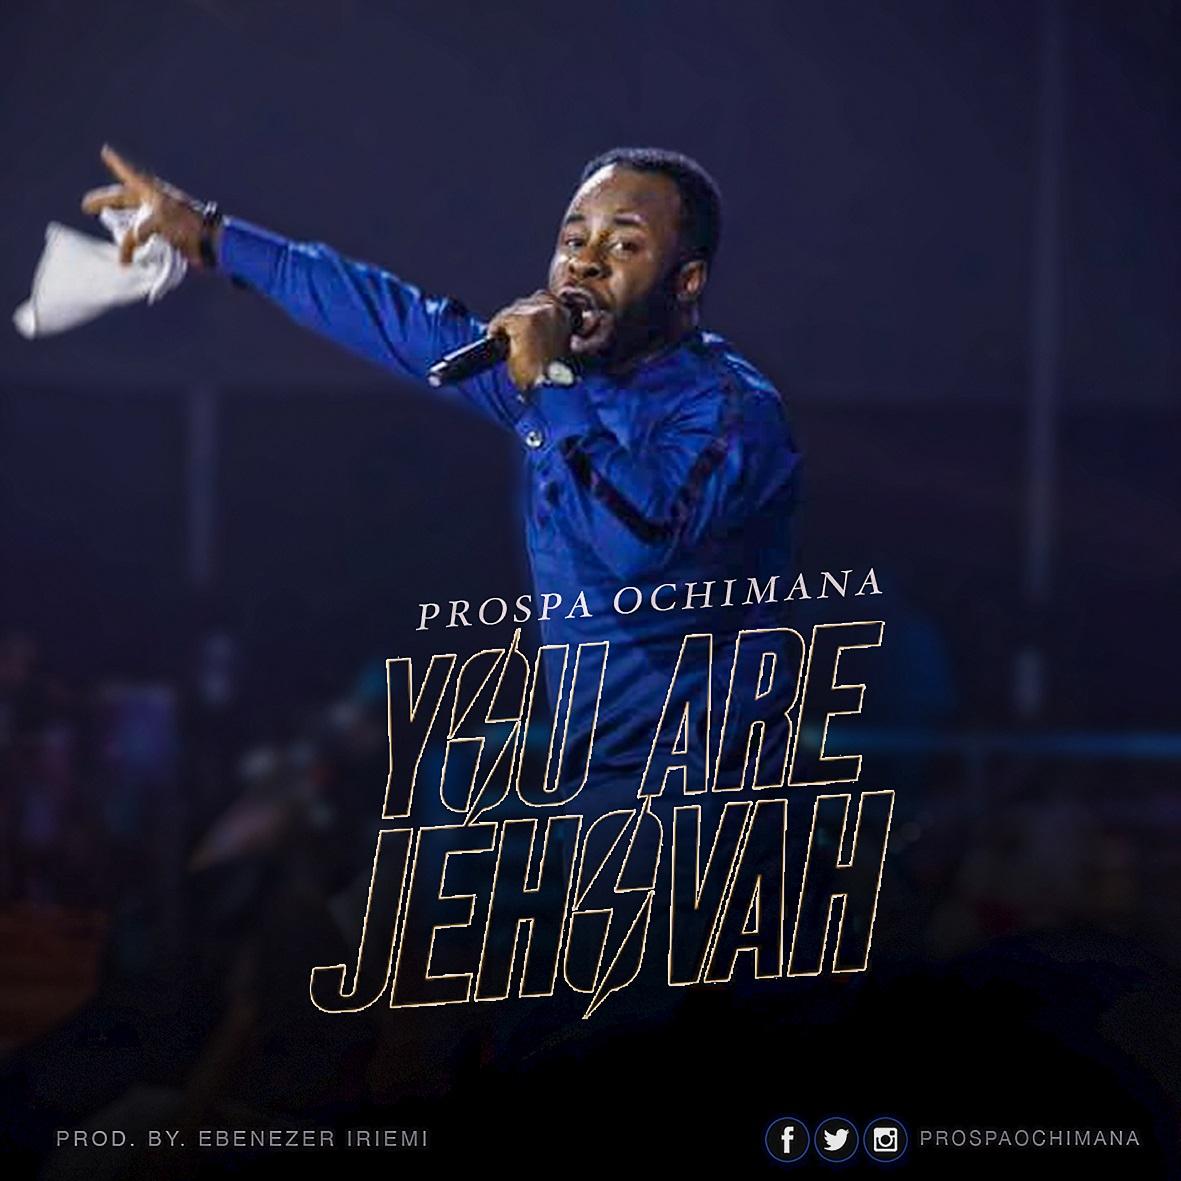 YOU ARE JEHOVAH BY PROSPA OCHIMANA | @PROSPAOCHIMANA